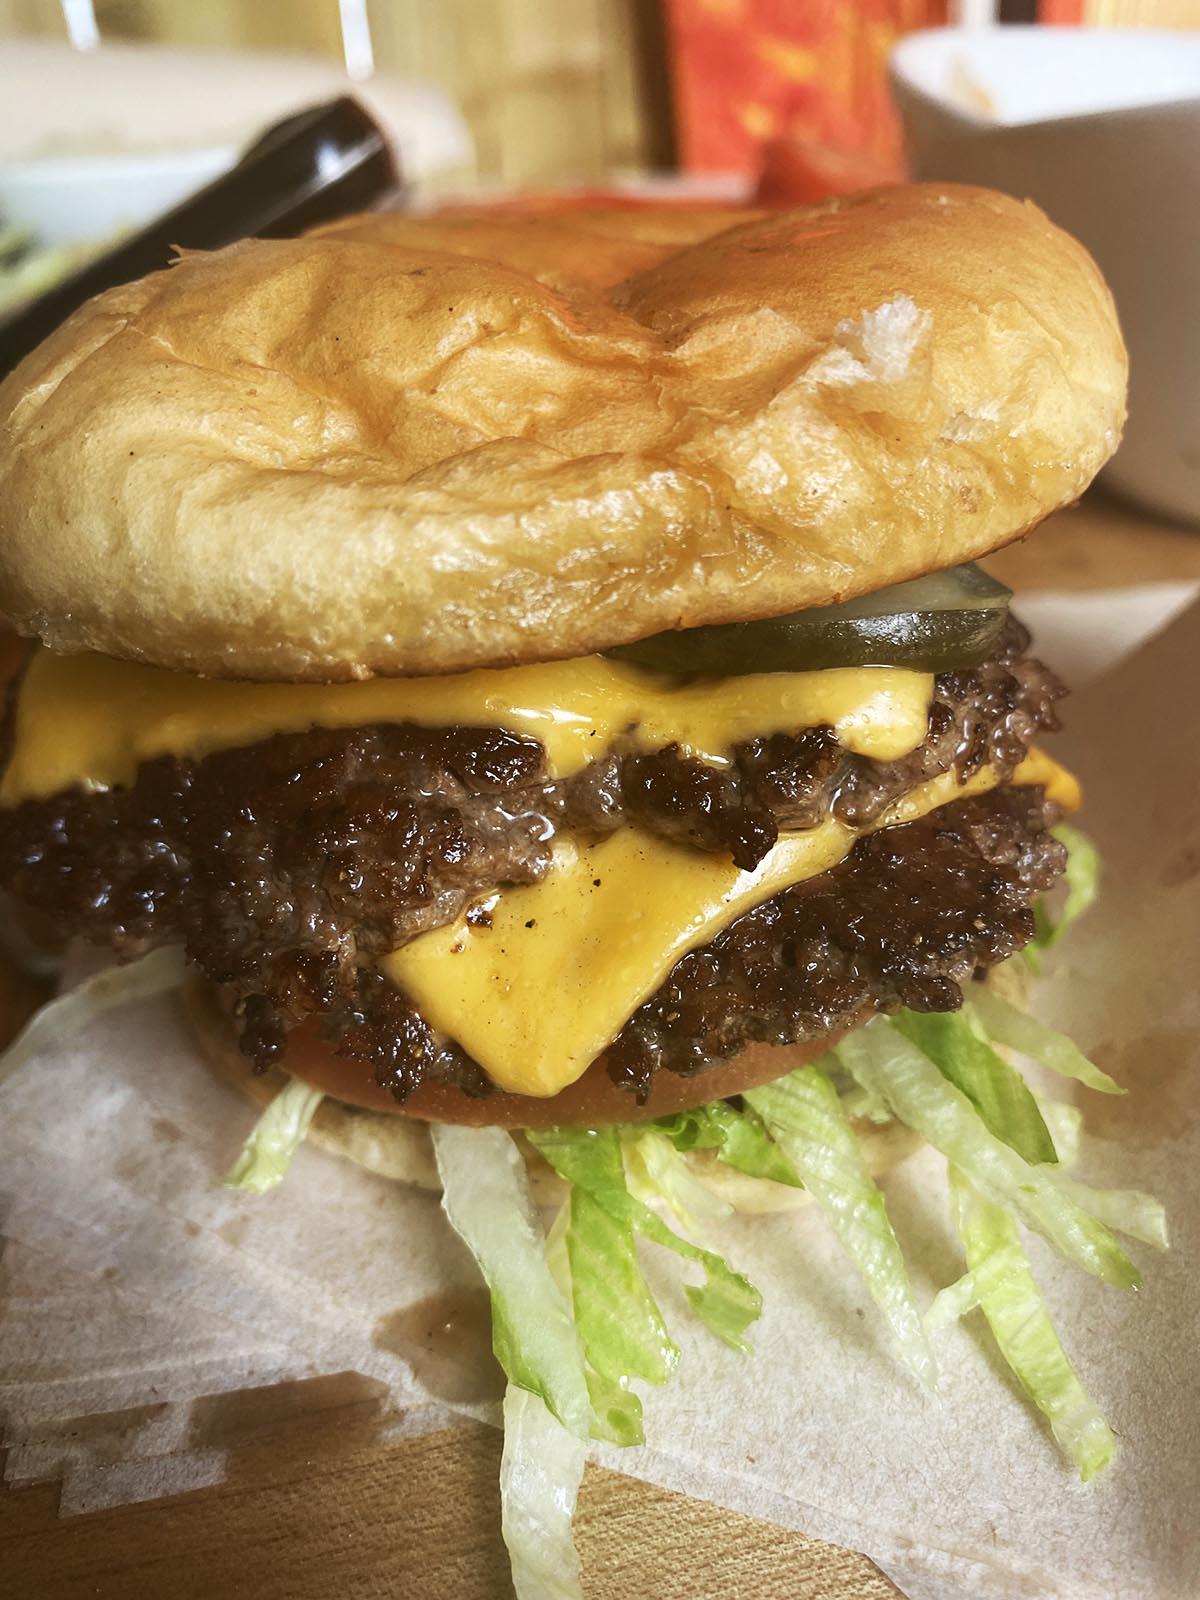 Smash burger prepared